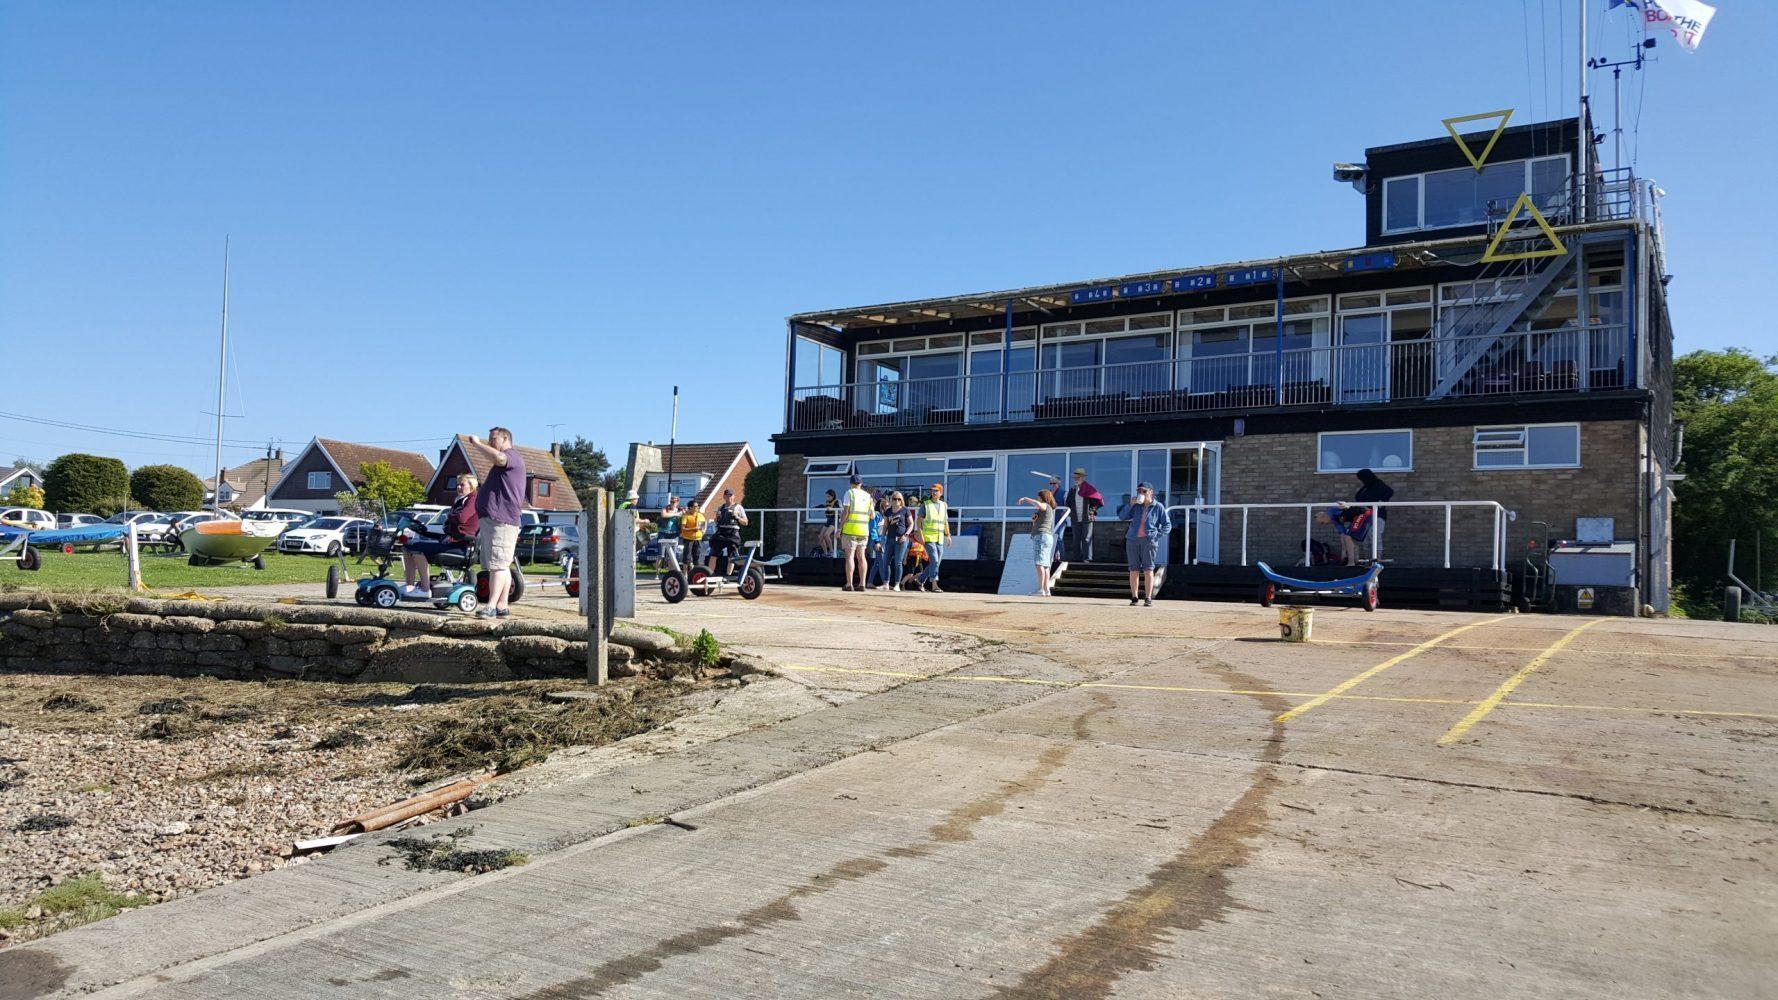 Maylandsea Bay Sailing Club